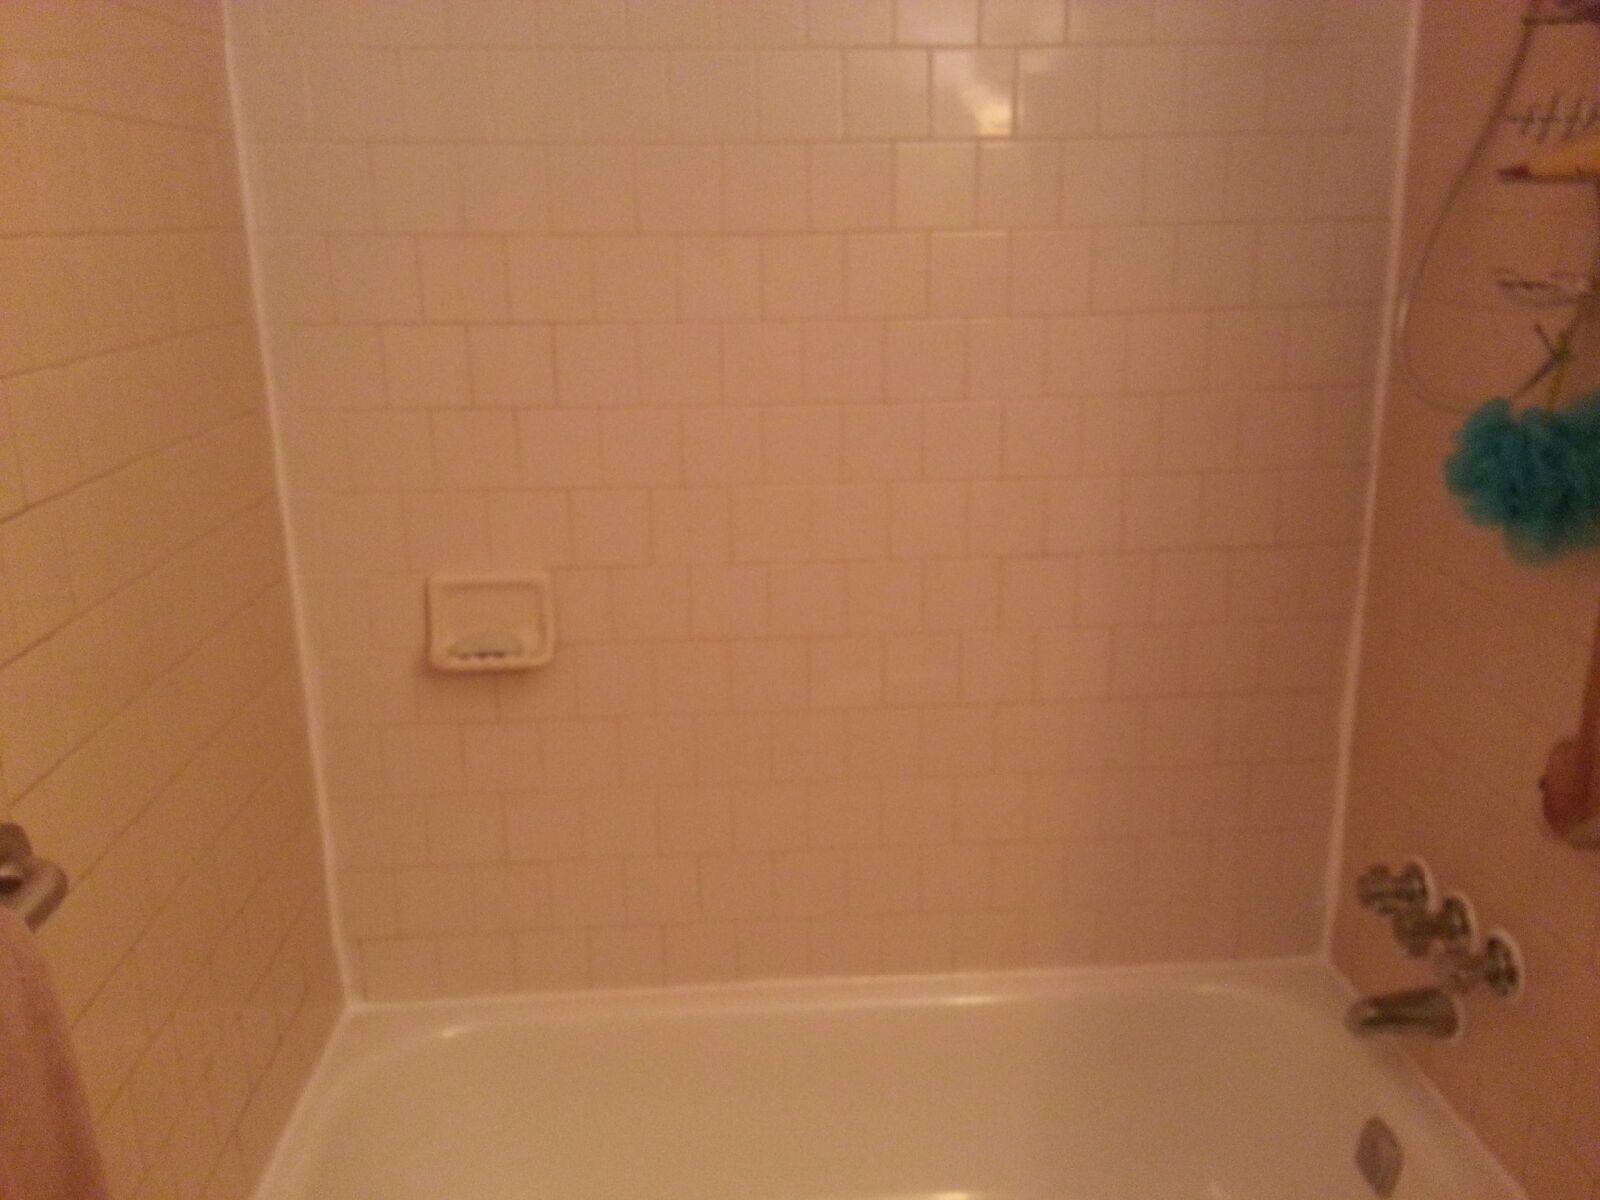 Bathroom Caulking Service Awesome Caulking Specialists With - Bathtub caulking service